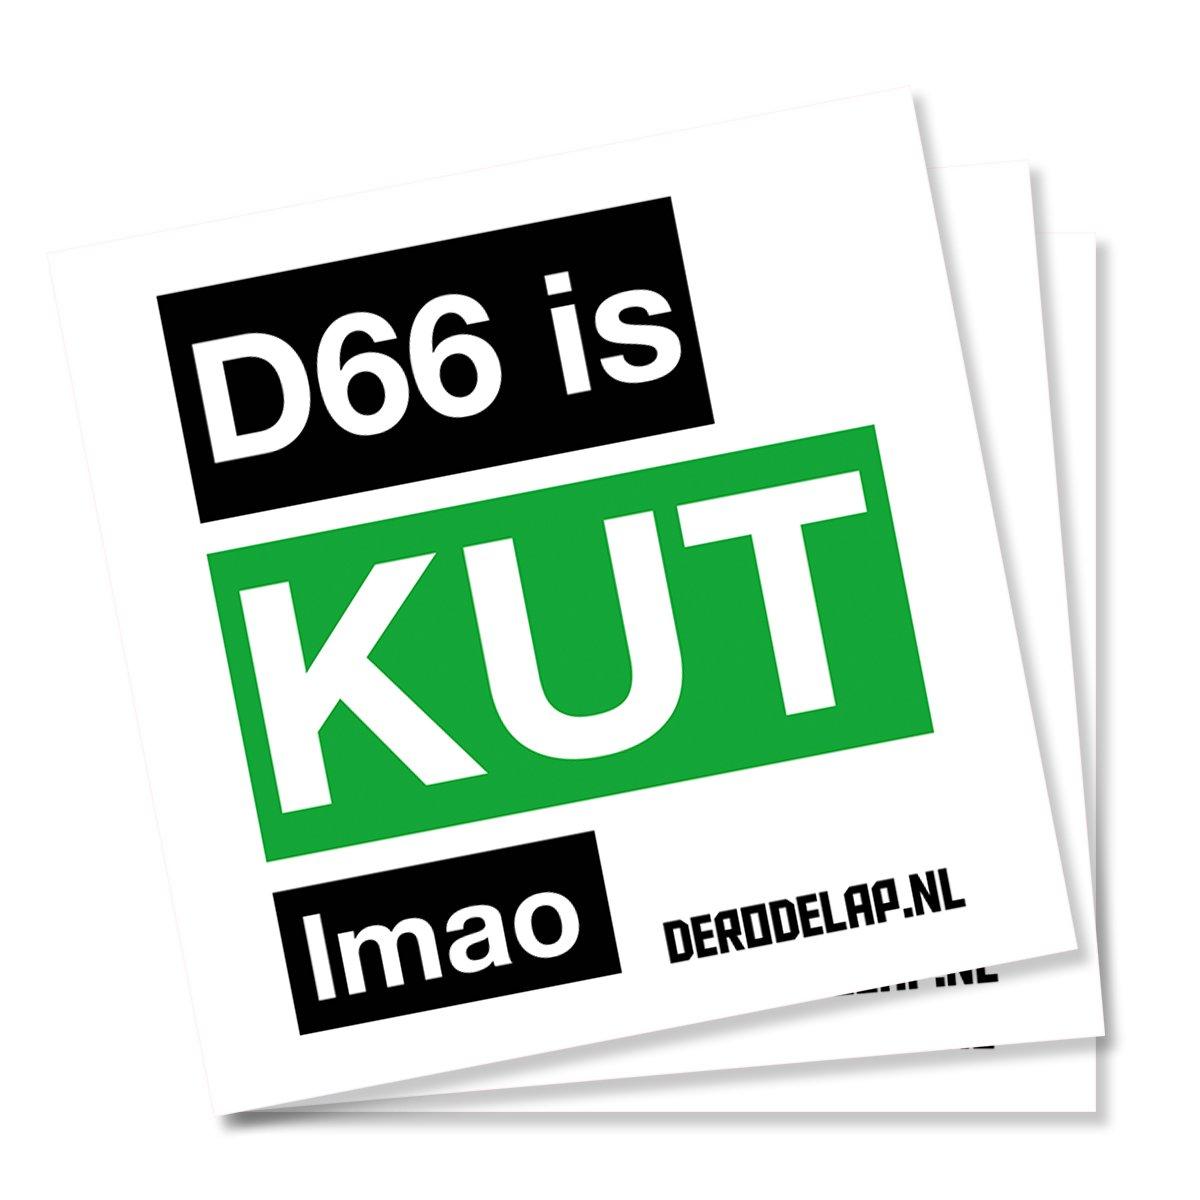 @D66 @geertwilderspvv Uit koeltorens komt geen zwarte rook. #fakenews